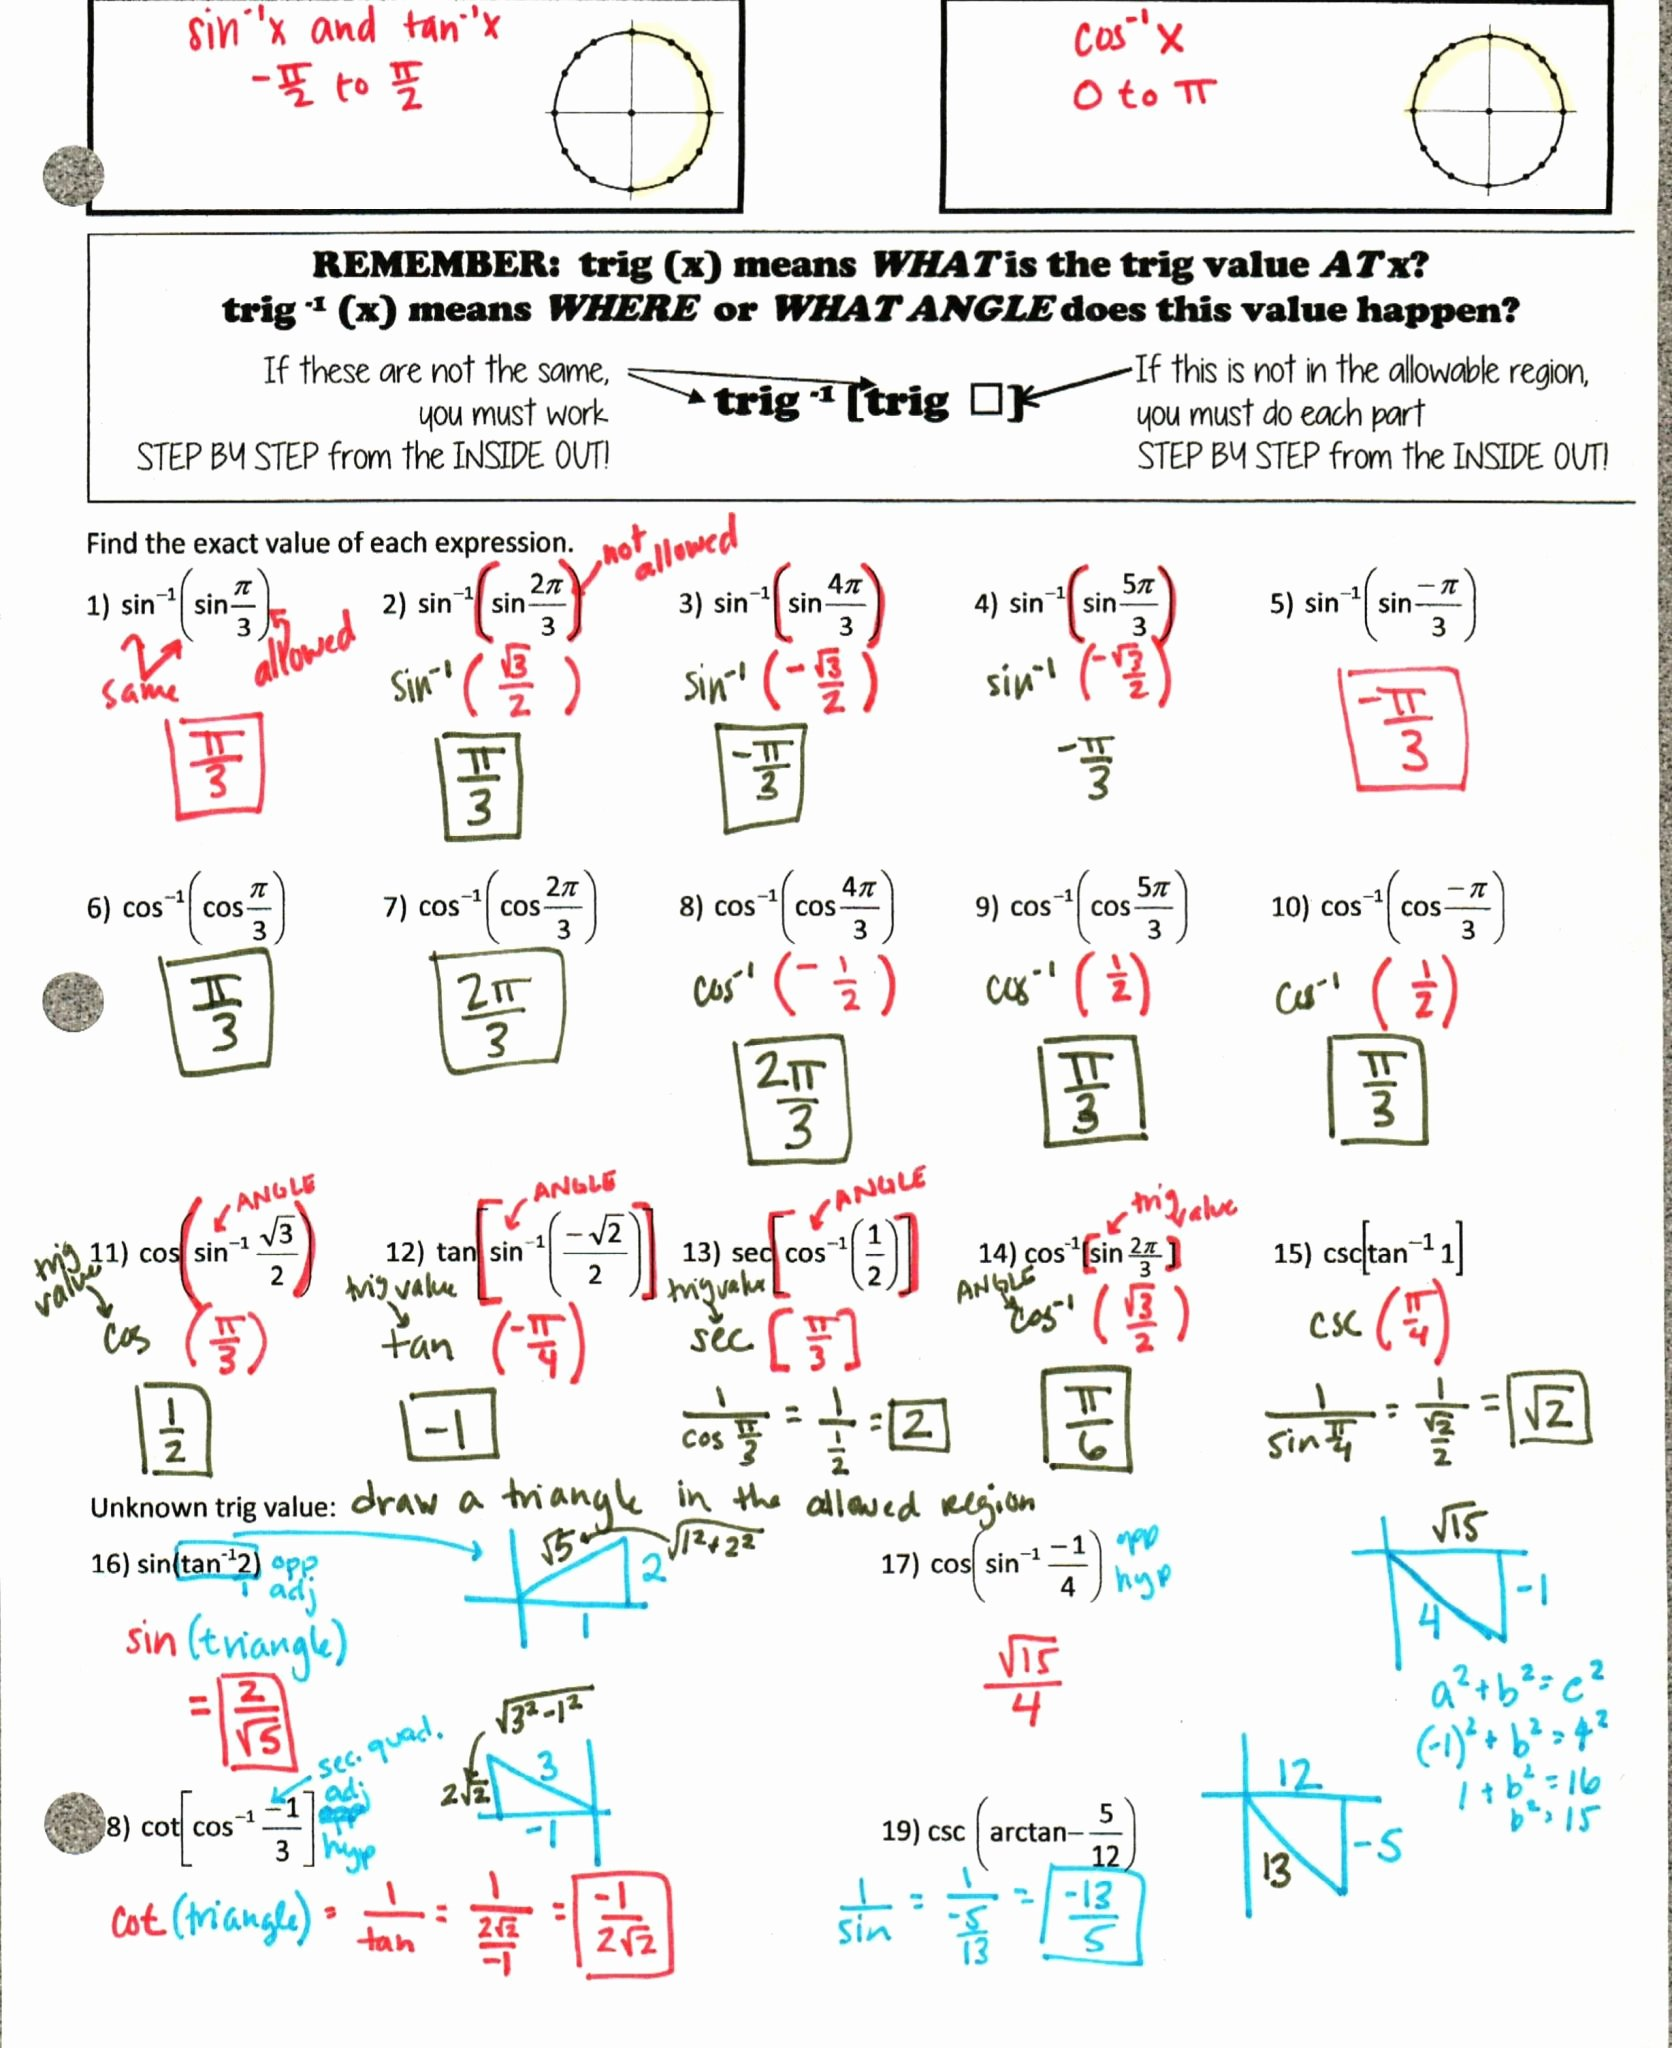 Unit Circle Worksheet with Answers Awesome Chemistry Unit 6 Worksheet 1 Answer Key